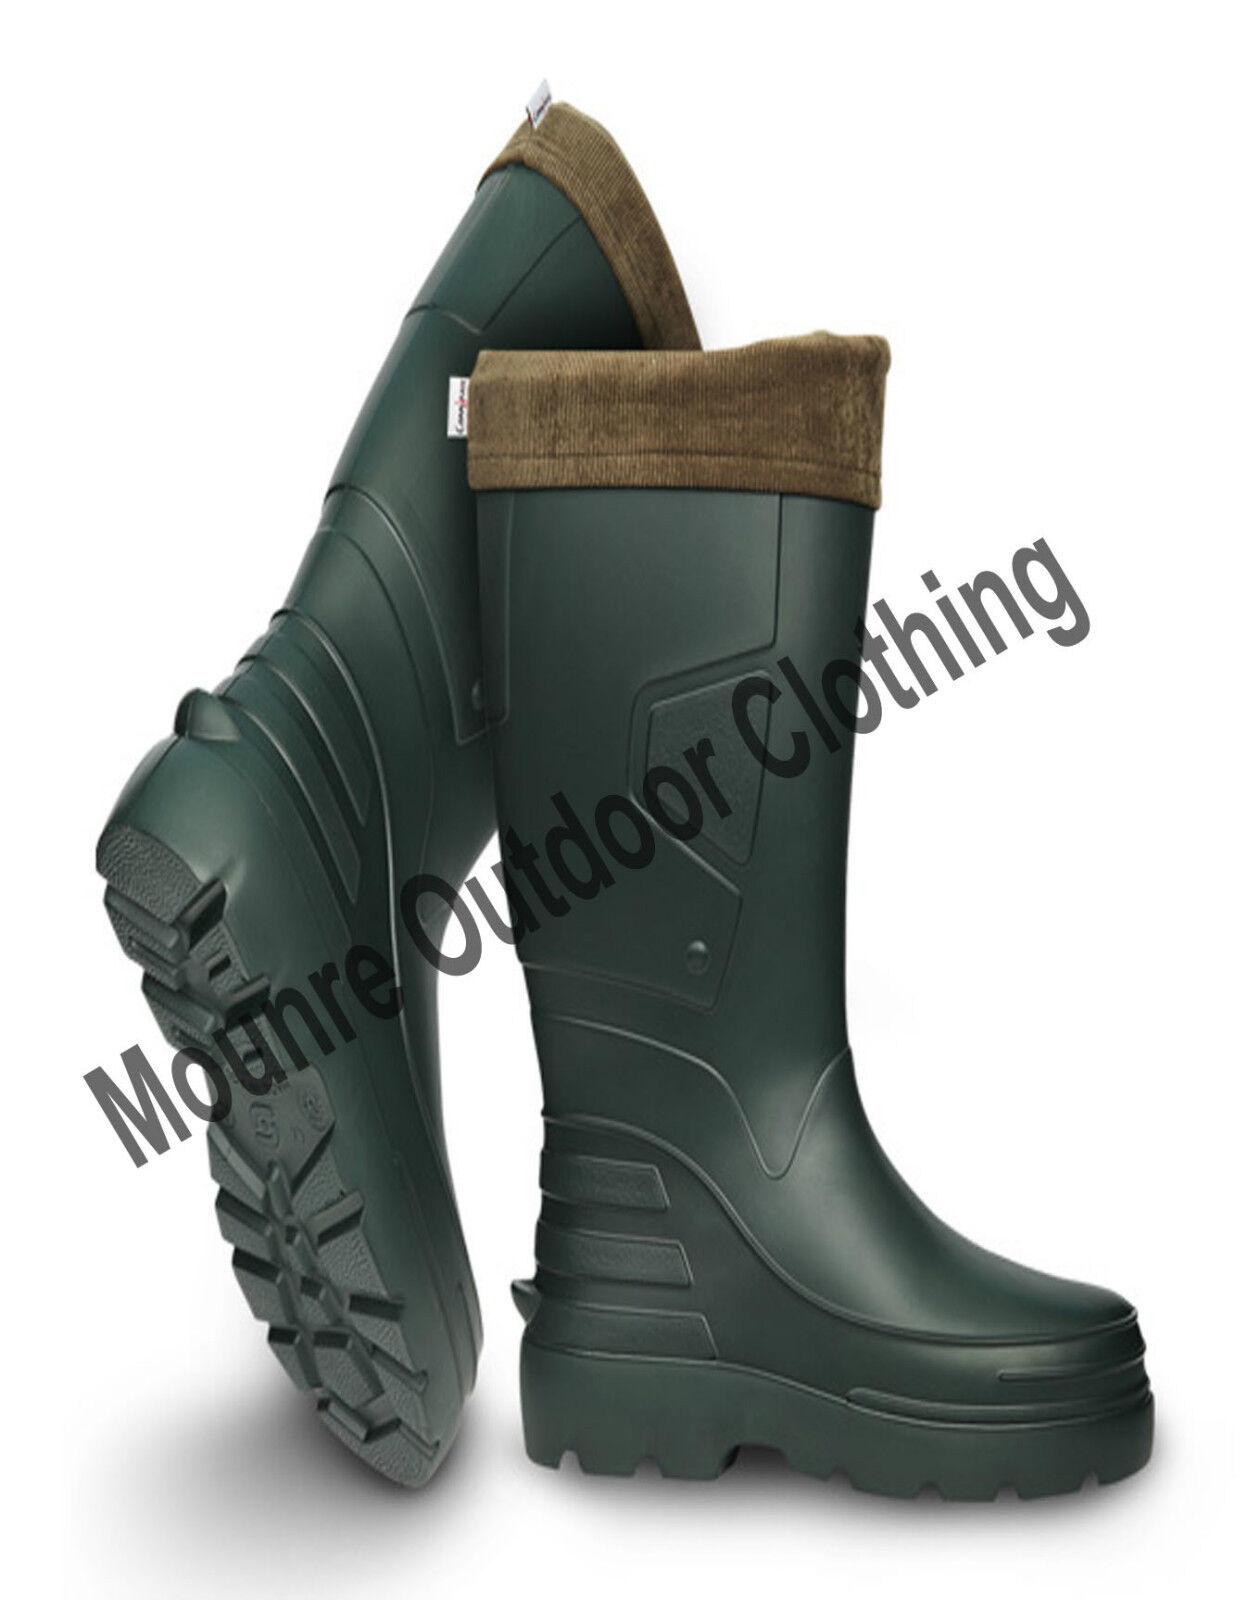 New Camminare Angler Agri Pro Lite Thermal Lightweight Wellington EVA Rain Boots